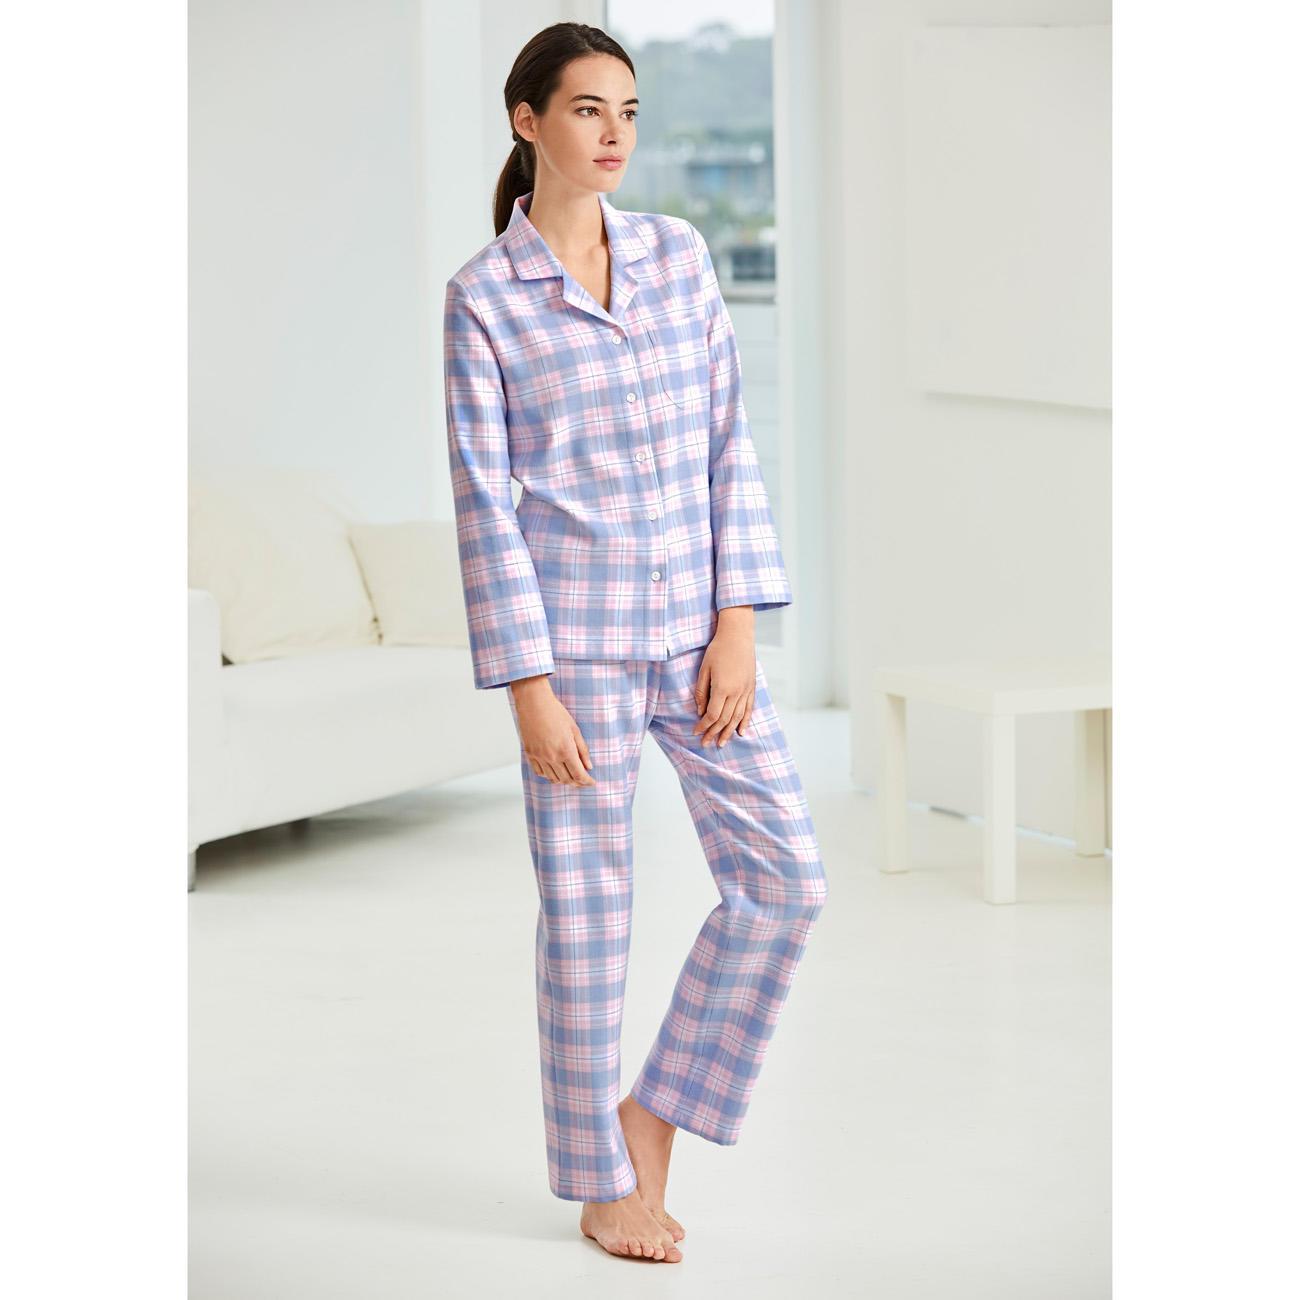 Pyjama carreaux en flanelle novila pas cher pro idee for Pyjama carreaux